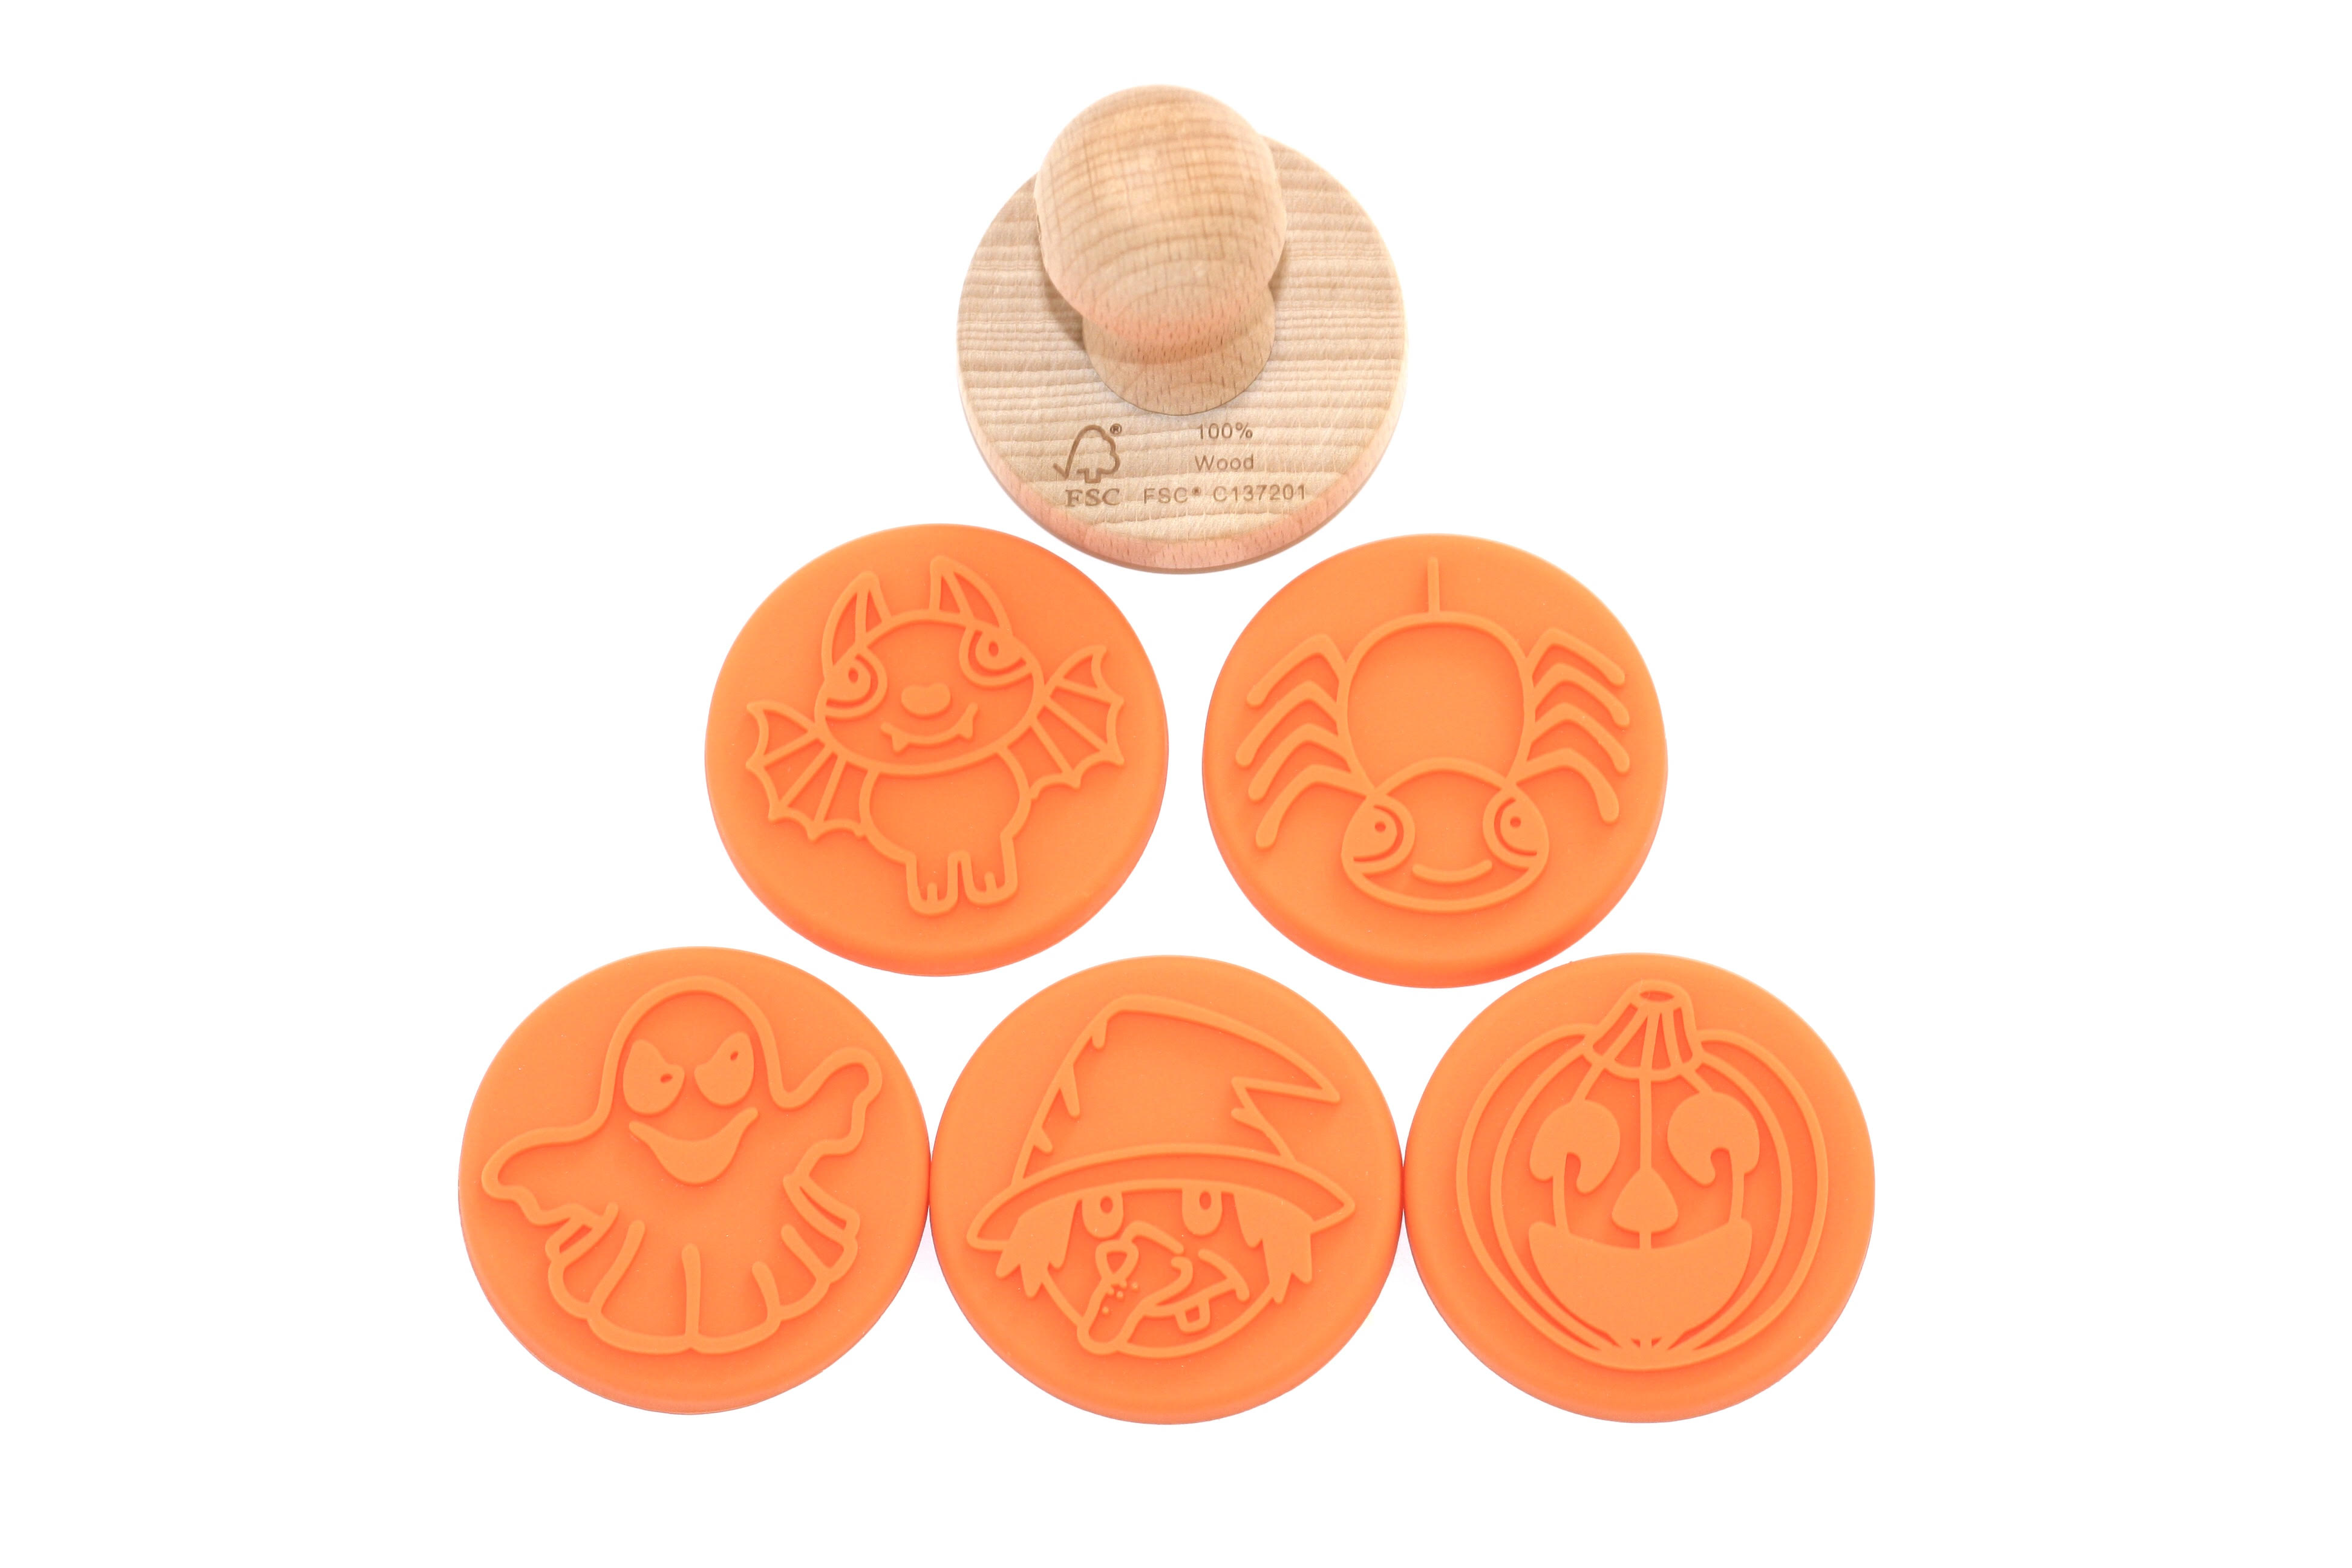 Img Galeria Set de 5 sellos Monstruos